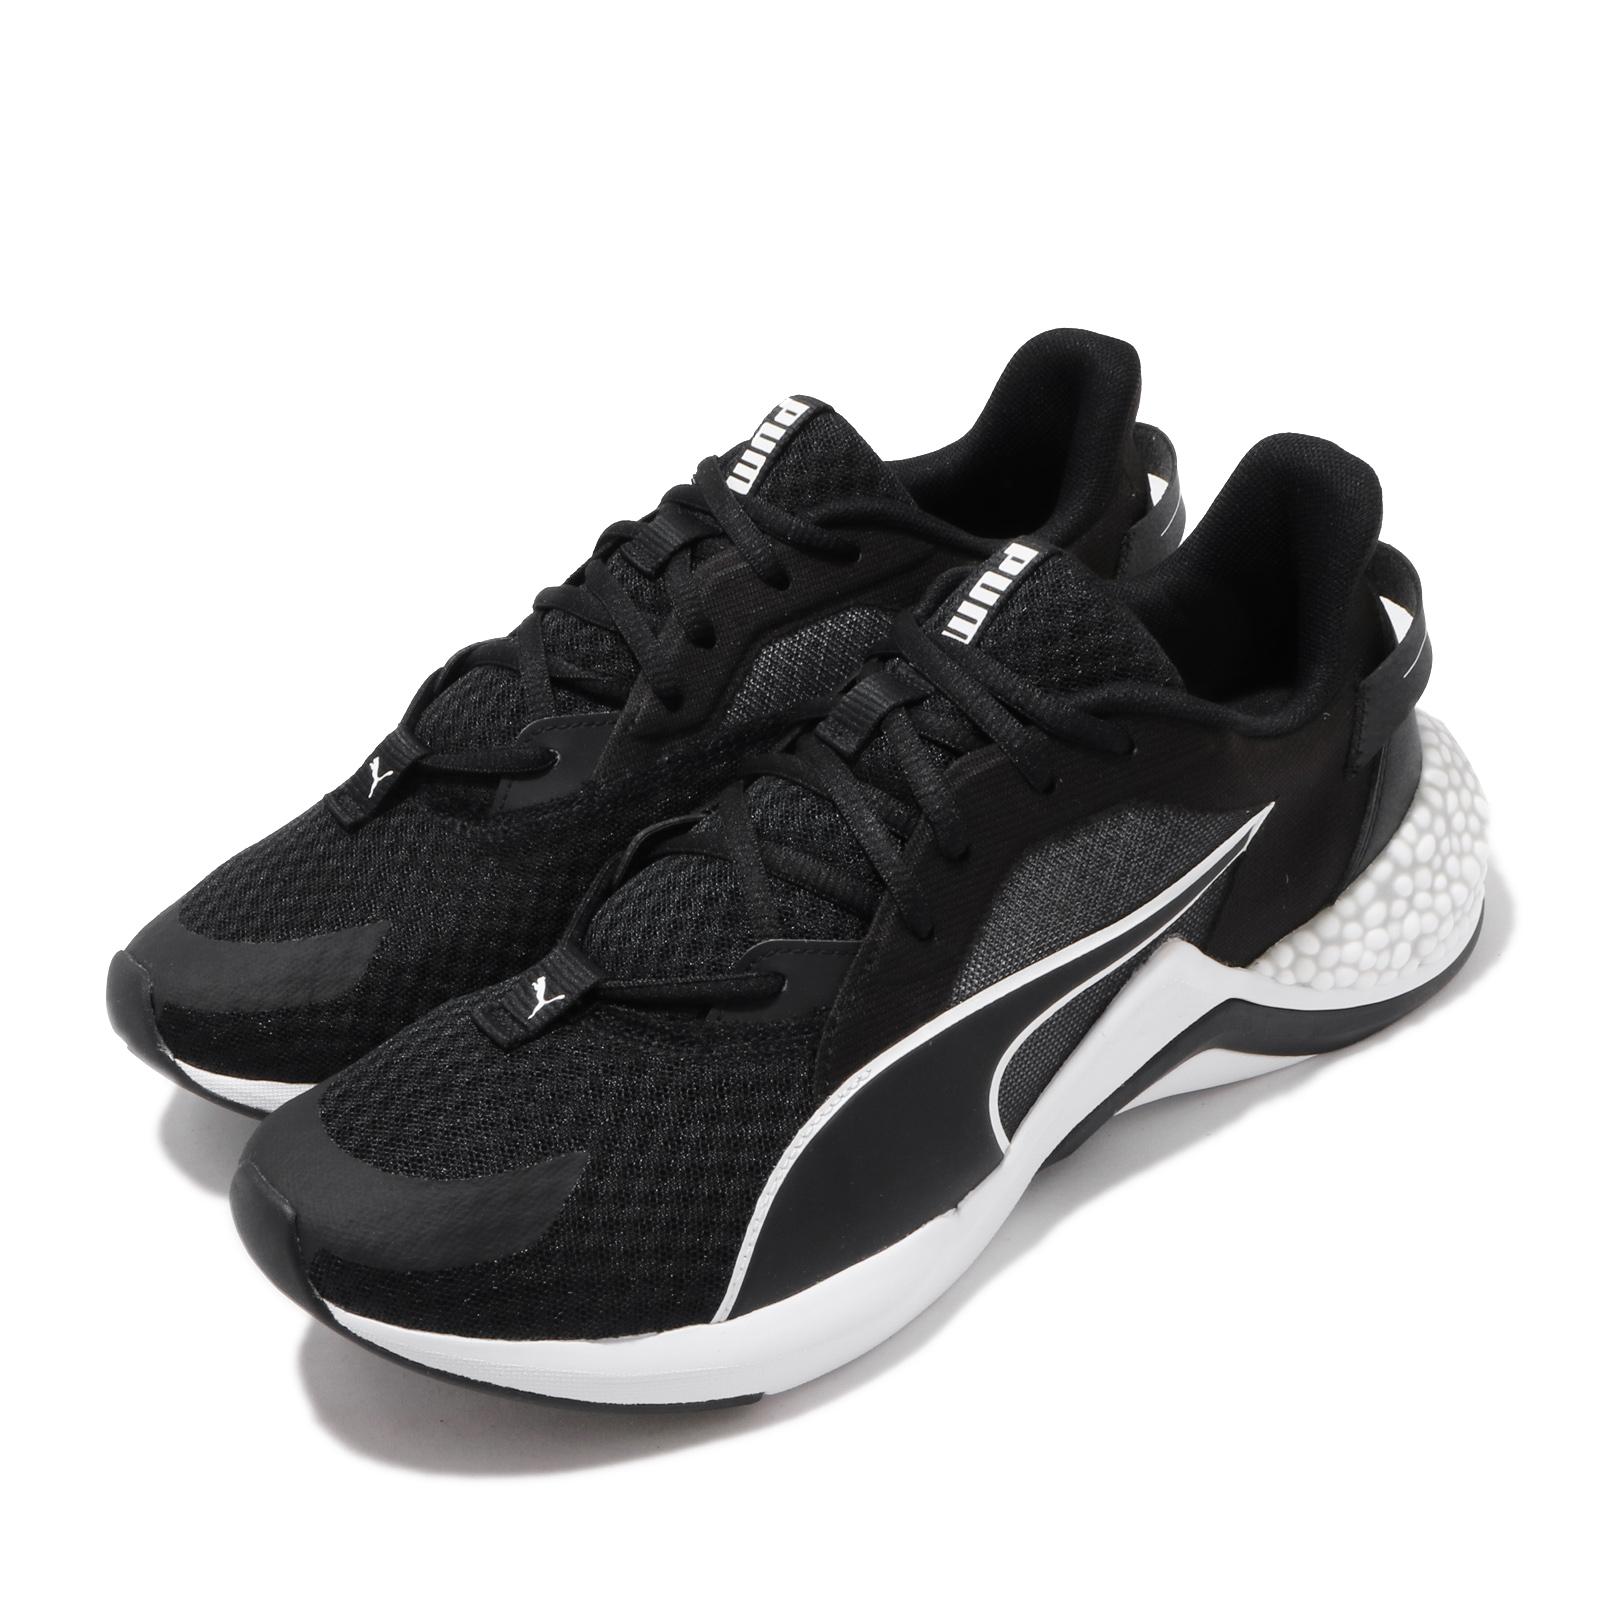 Puma 慢跑鞋 Hybrid NX Ozone 運動 男鞋 19338401